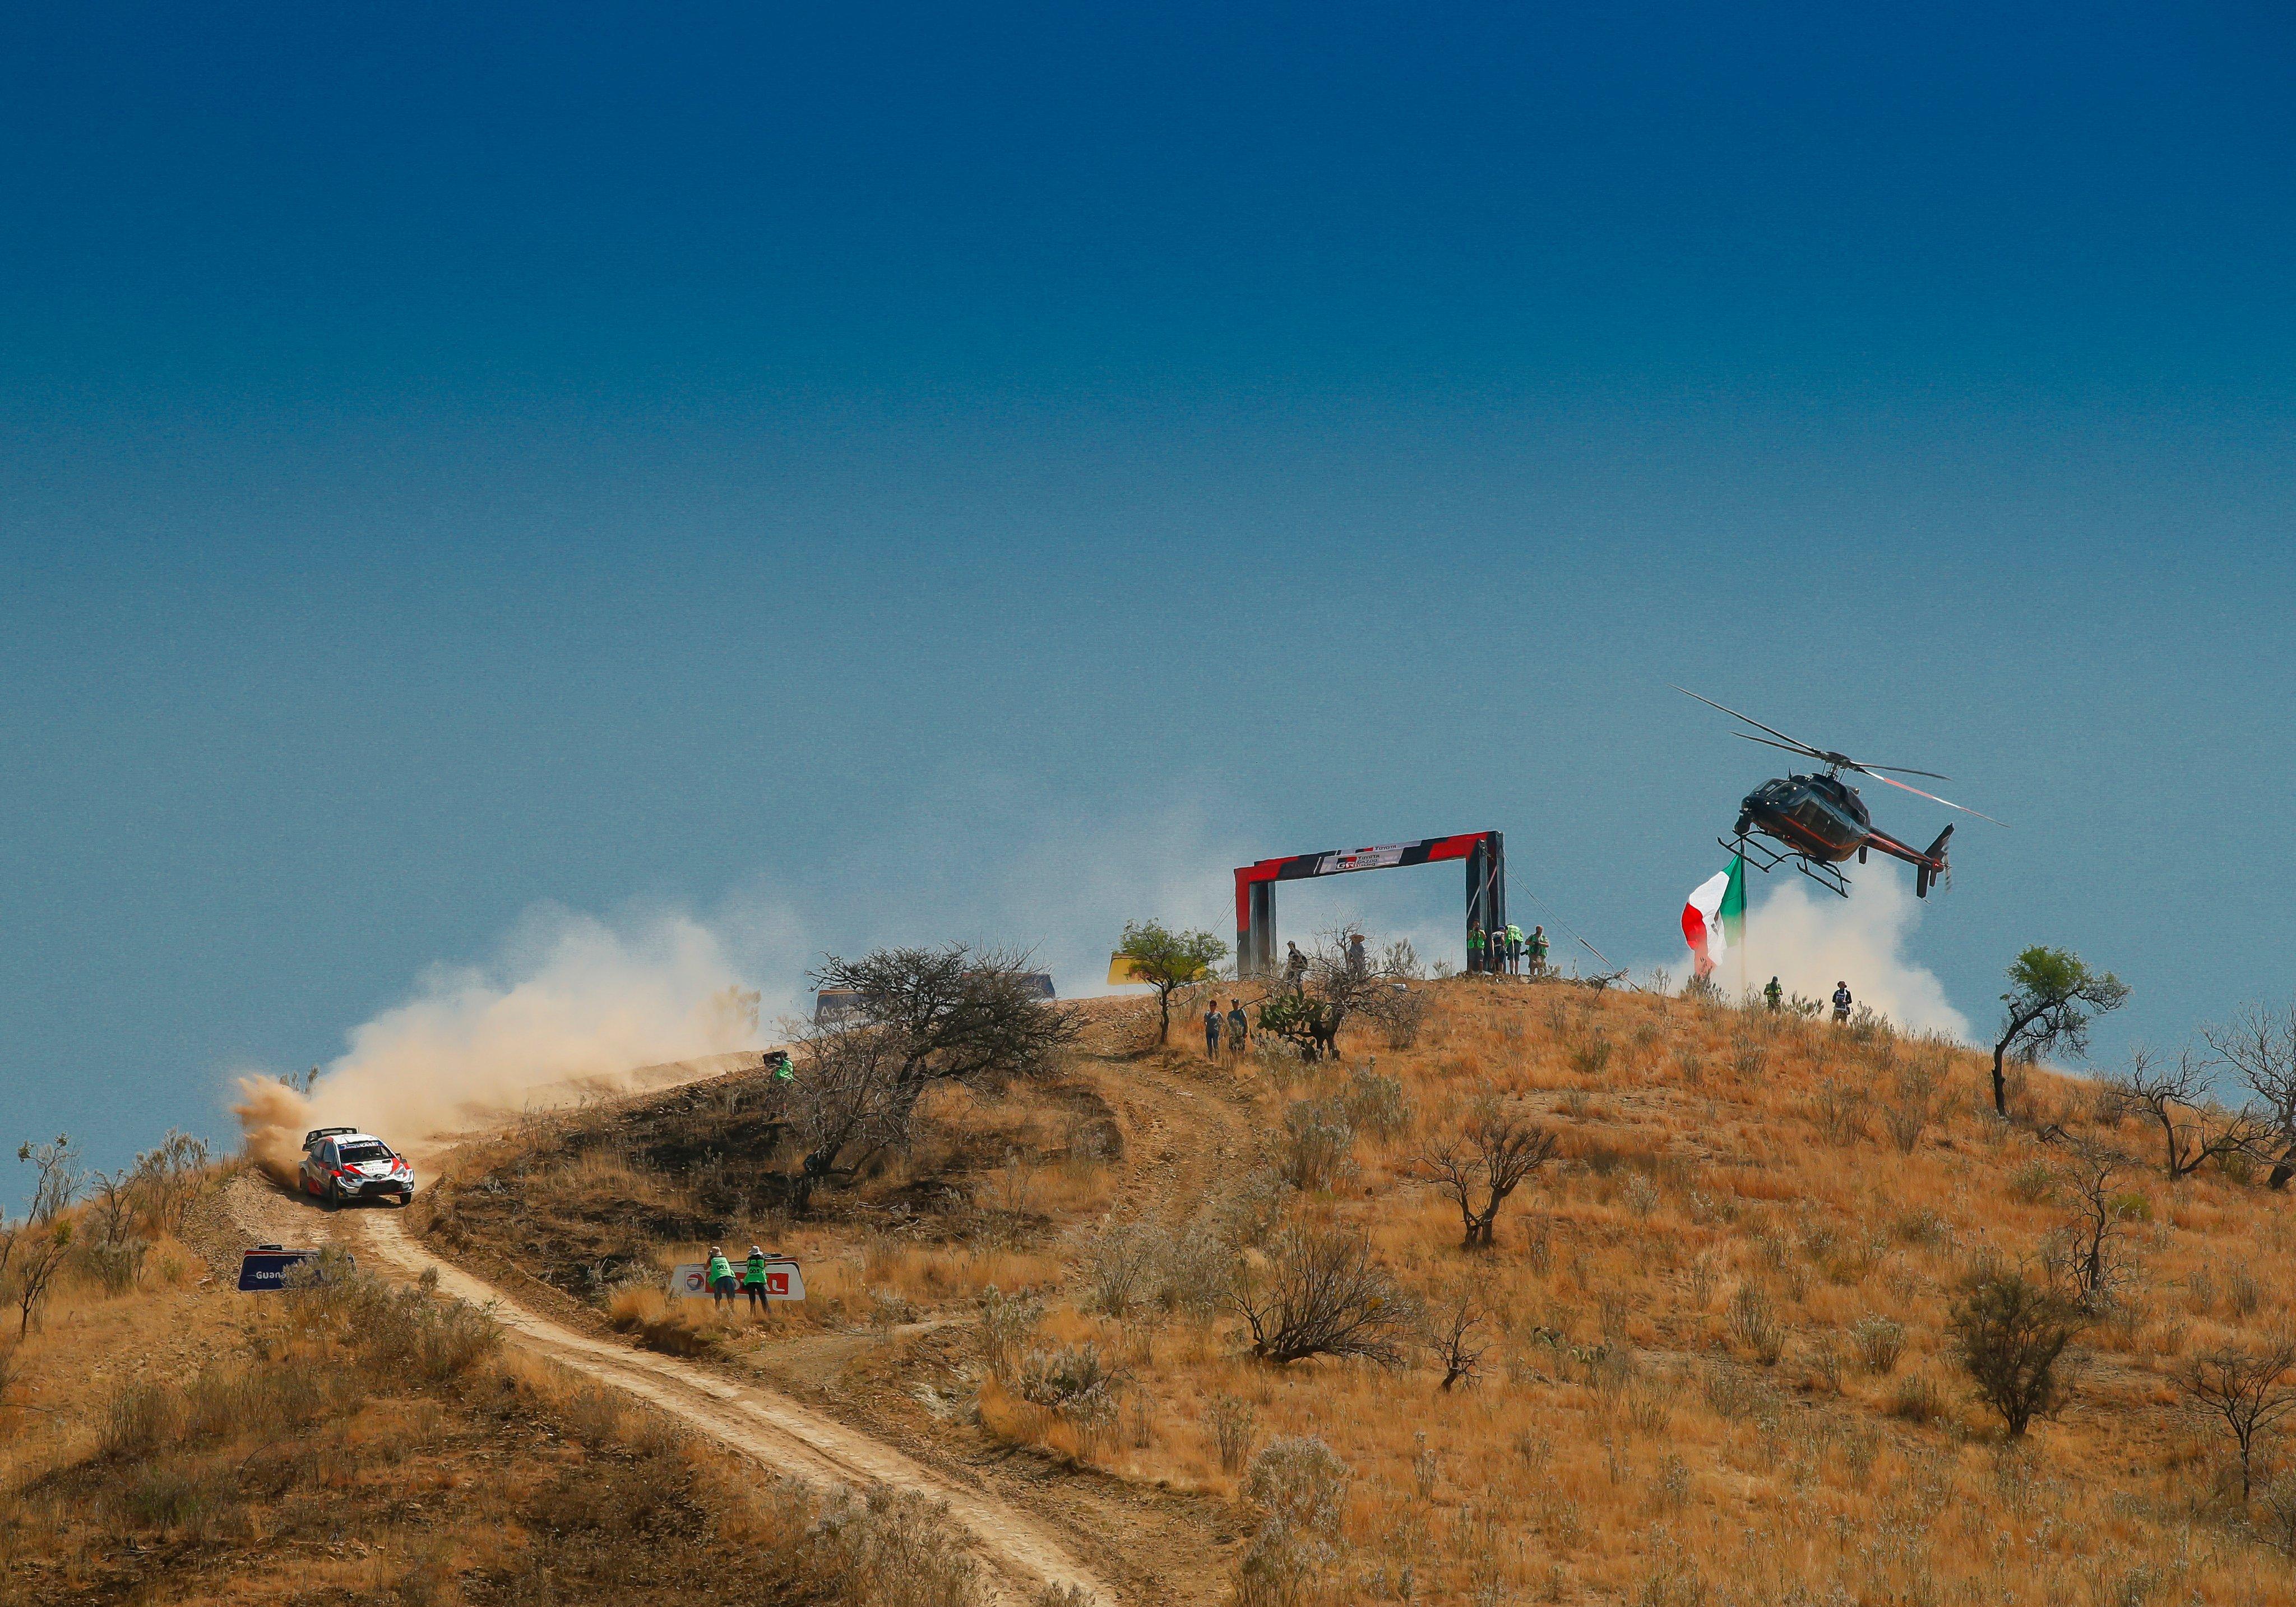 WRC: 17º Rallye Guanajuato Corona - México [12-15 Marzo] - Página 7 ETG2h7VX0AA0uAe?format=jpg&name=4096x4096